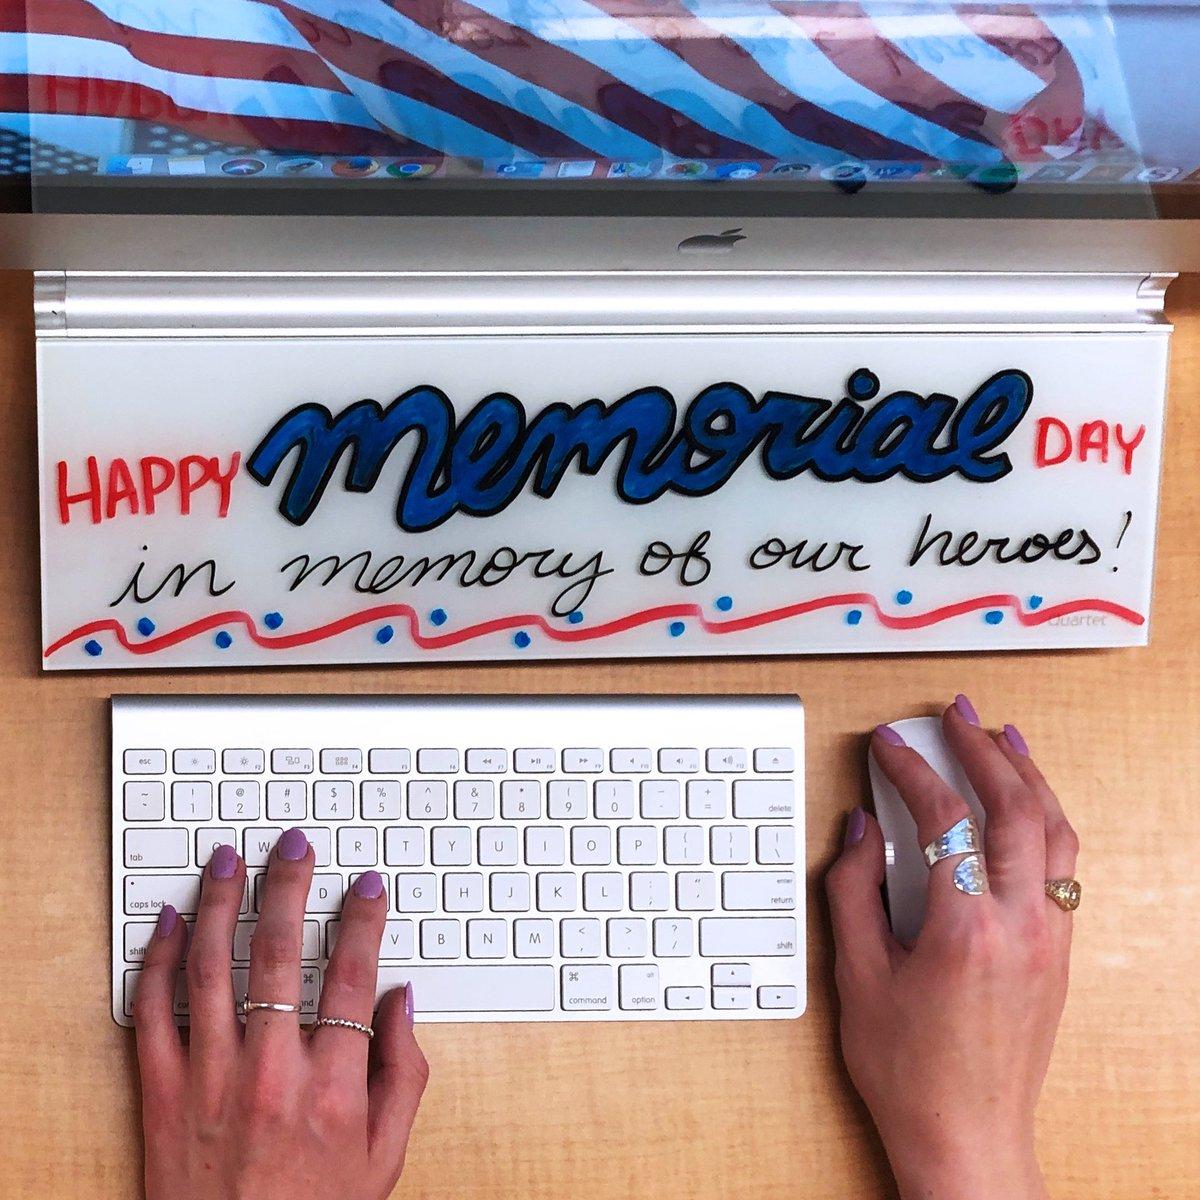 Happy Memorial Day! https://t.co/XtAWdWdzLU